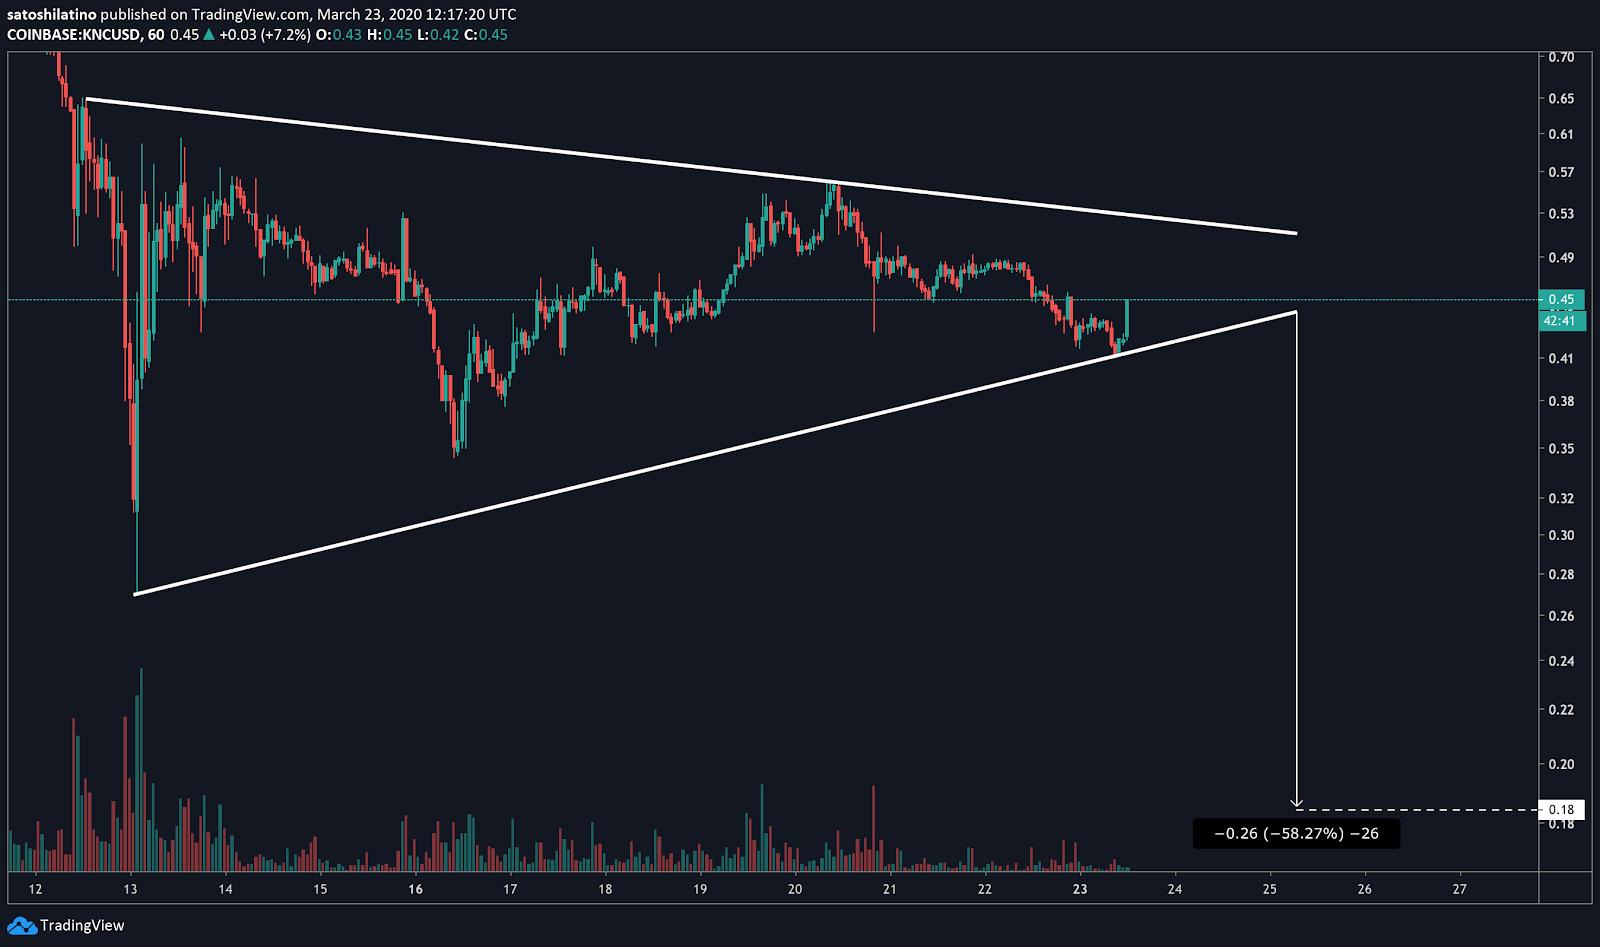 KNC/USD price chart on TradingView